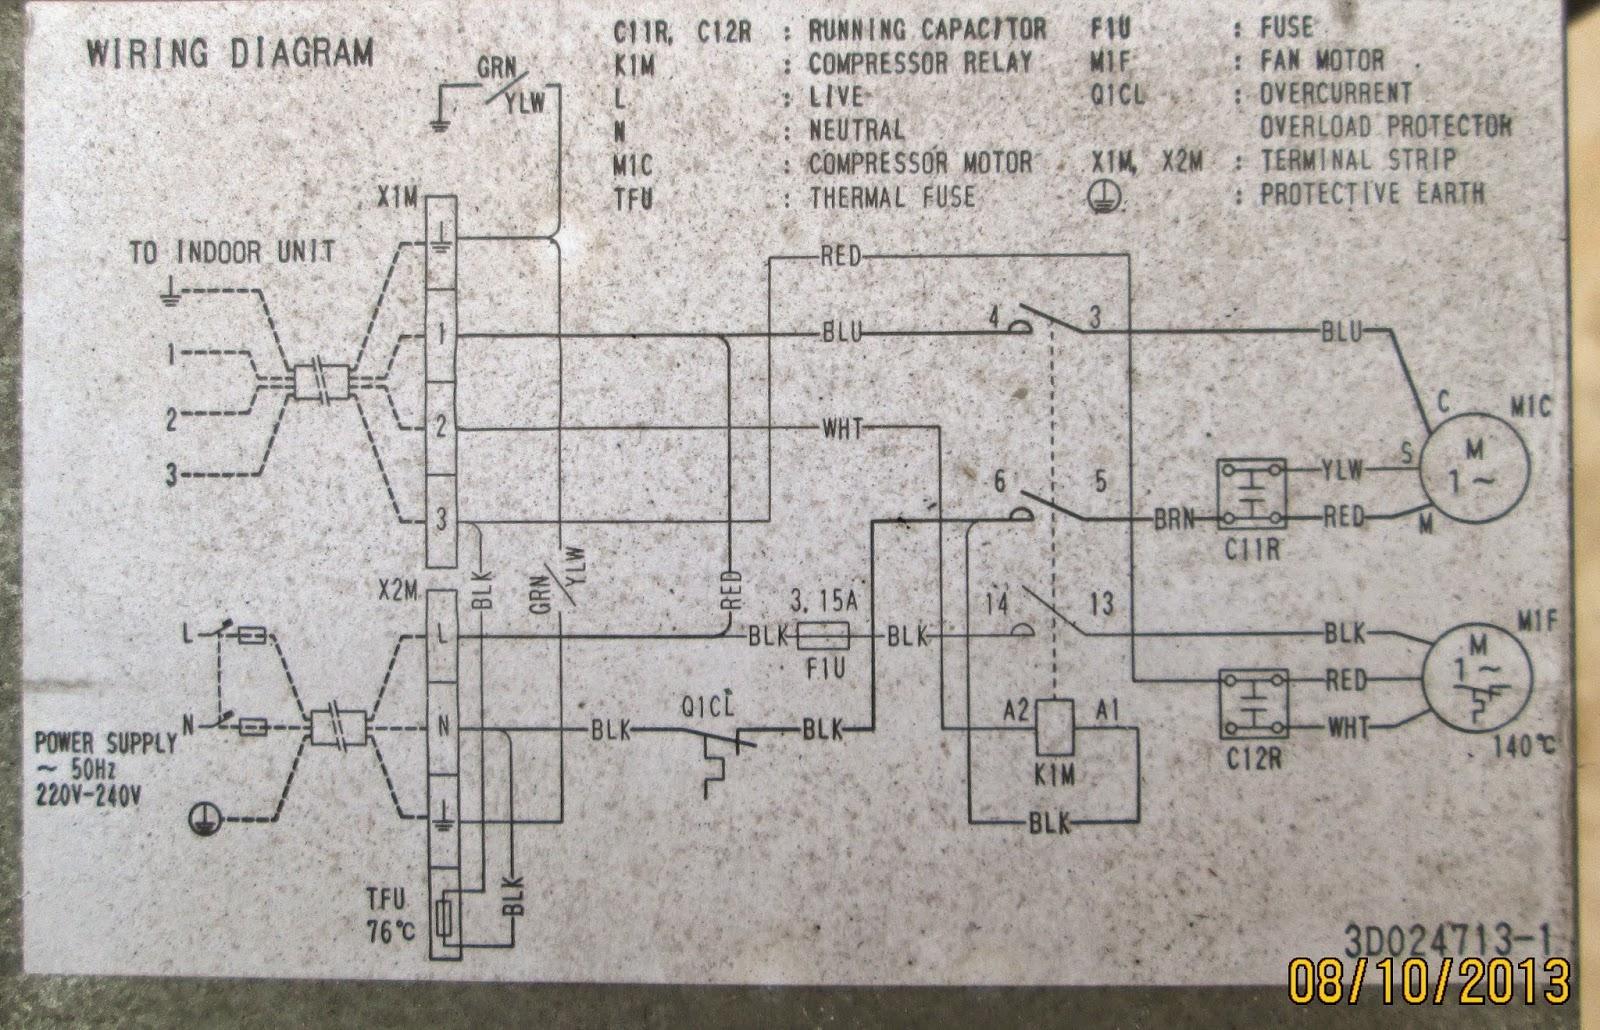 Wiring diagram indoor ac daikin jzgreentown daikin split ac wiring diagram daikin vrv system wiring cheapraybanclubmaster Choice Image